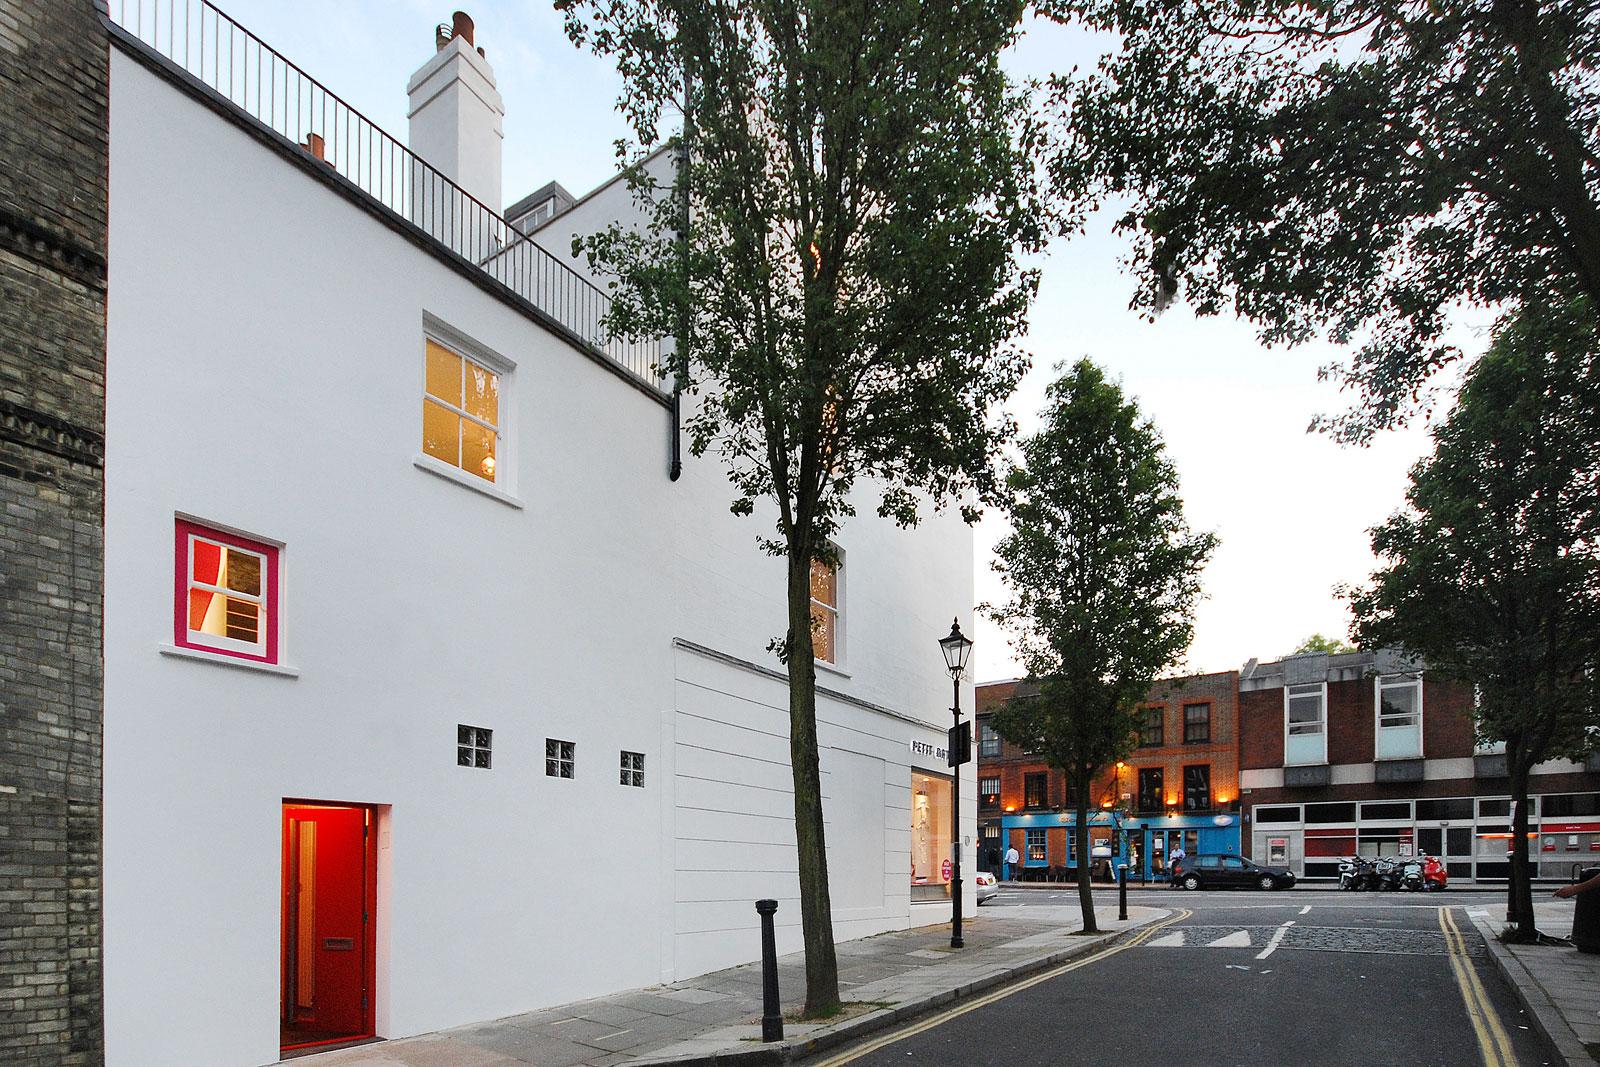 Casa Roja, entrance from street